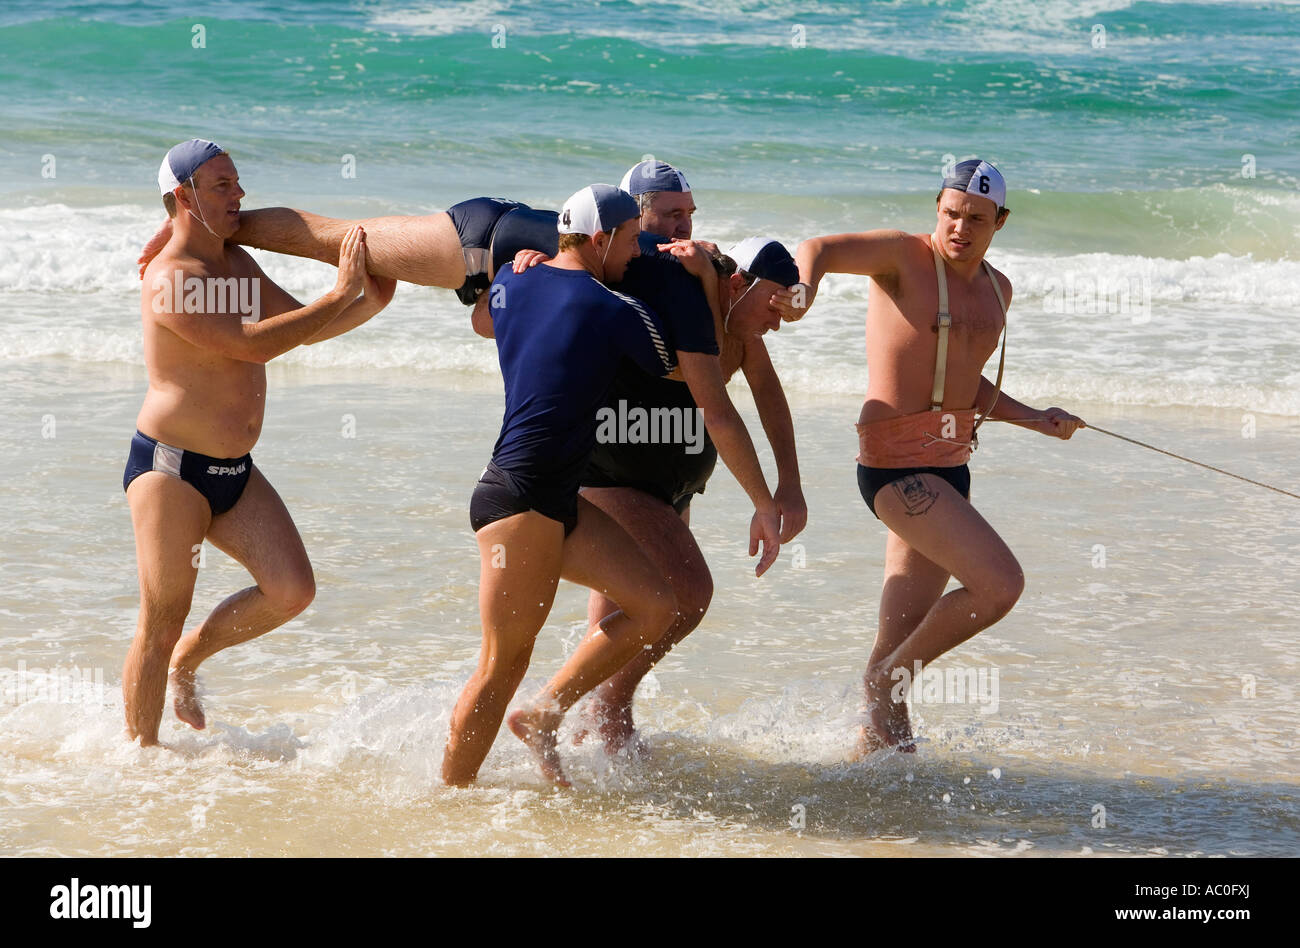 Lifesavers Practice A Surf Rescue On Bondi Beach Using The Stock Photo Alamy